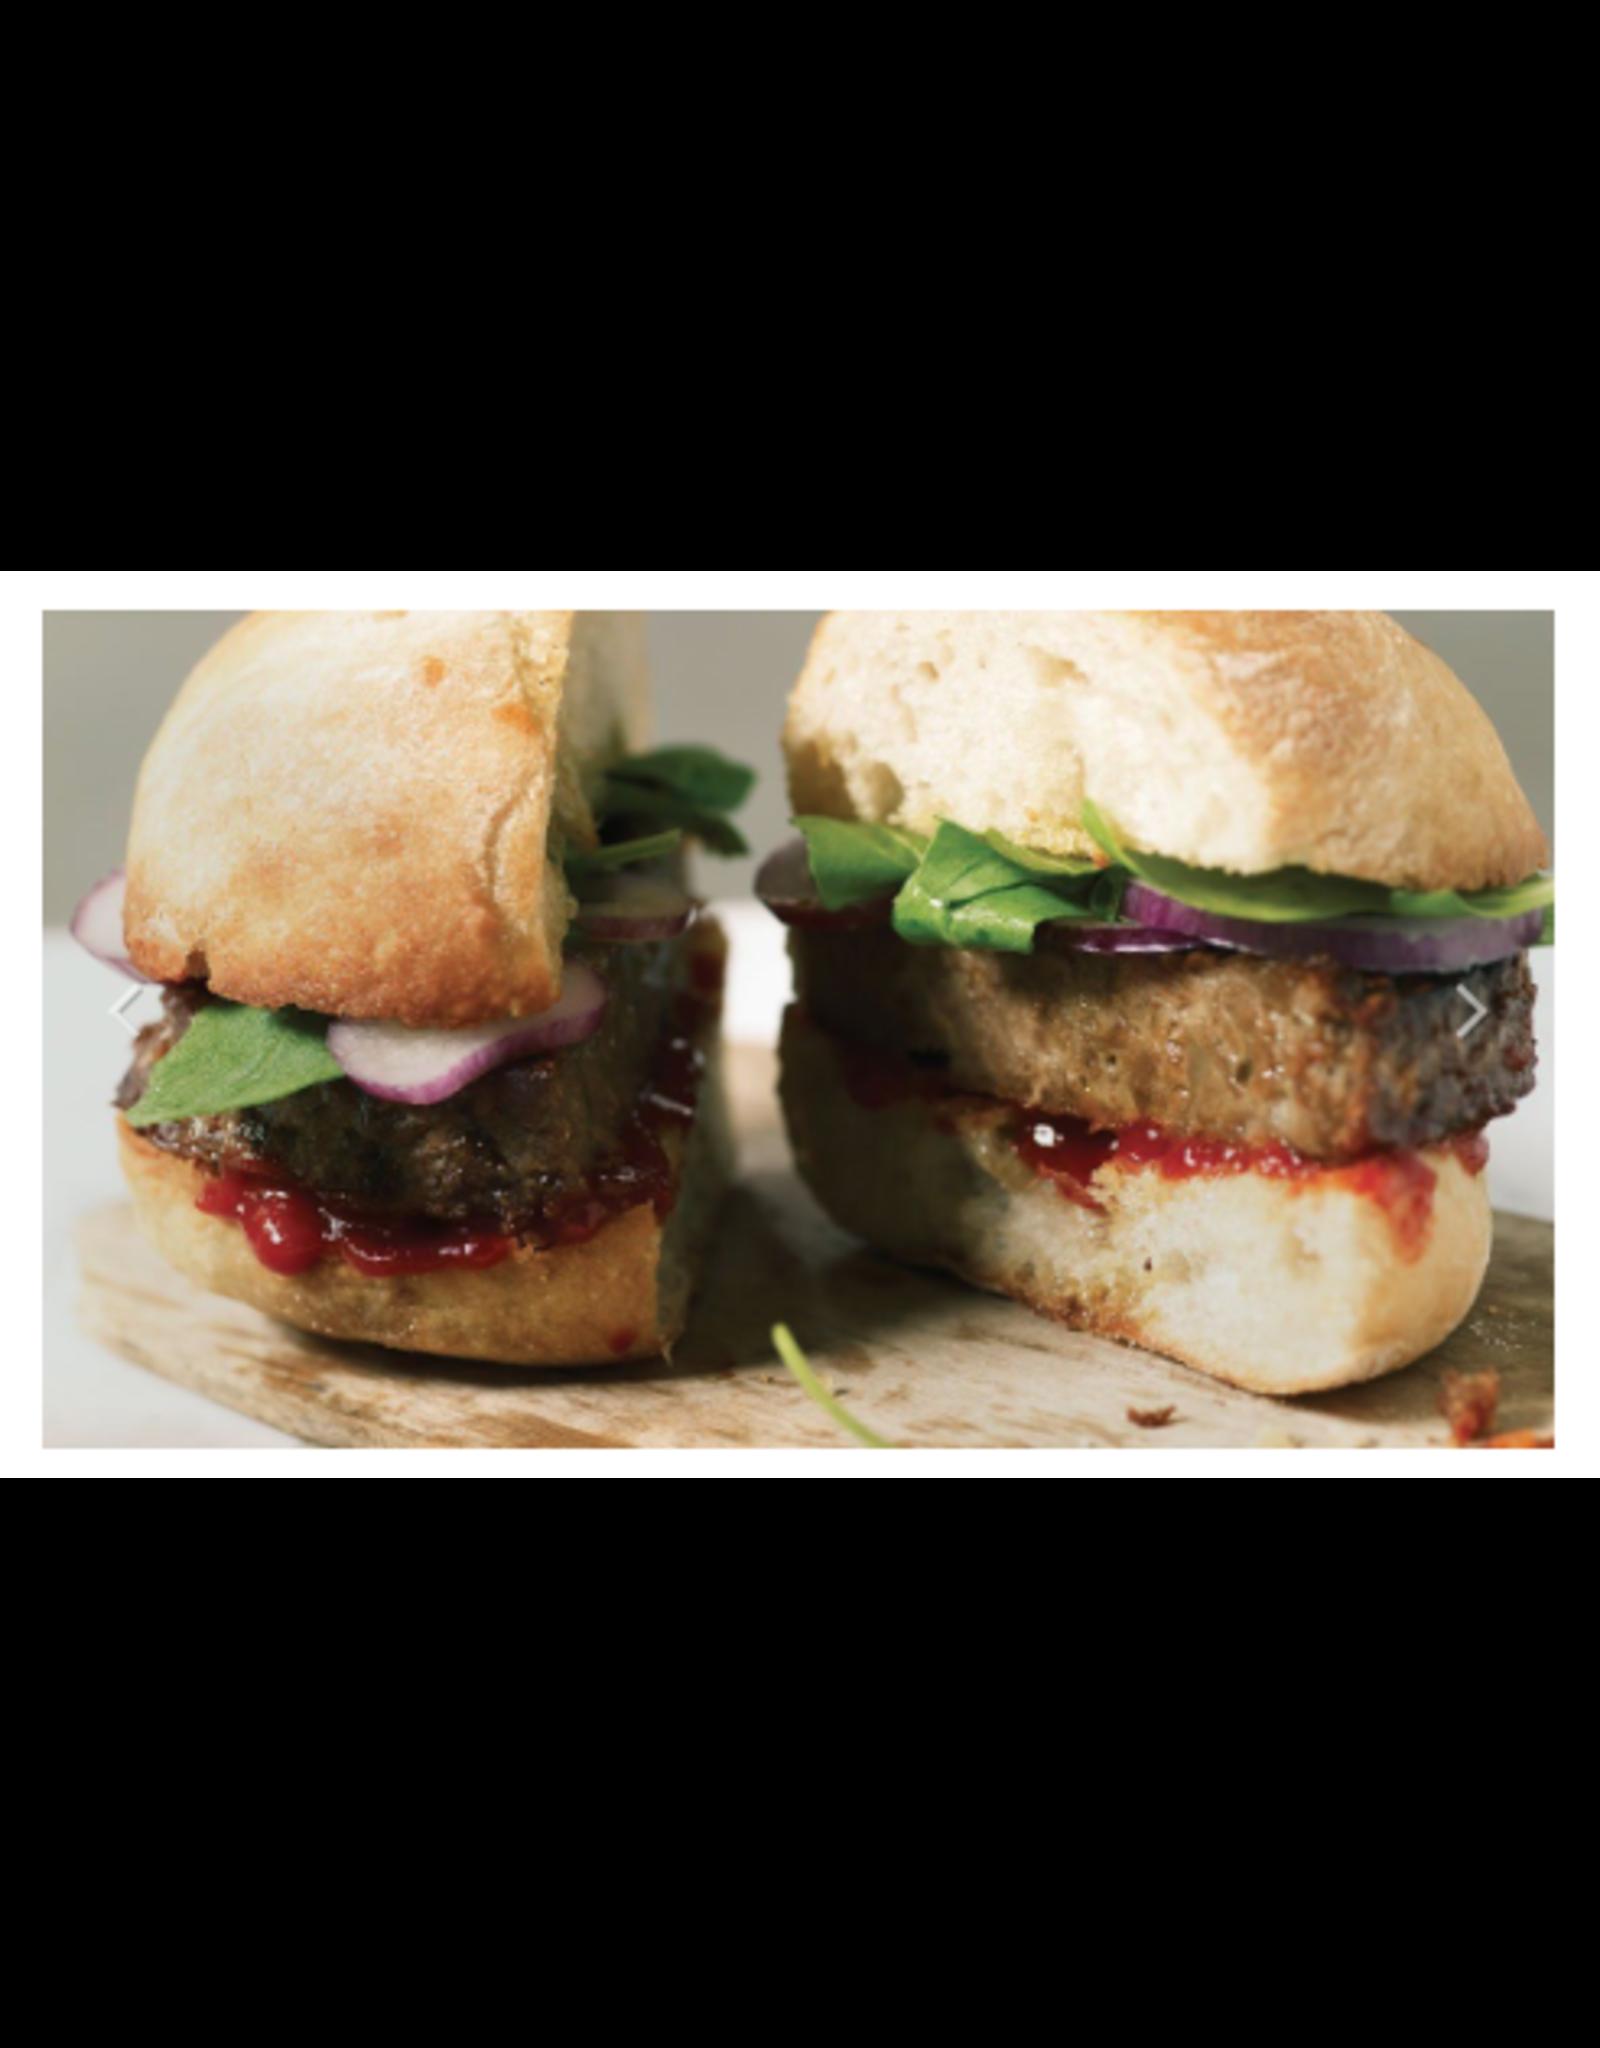 Linda Mccartney Veganer Hamburger 1/4 Libra, 227g